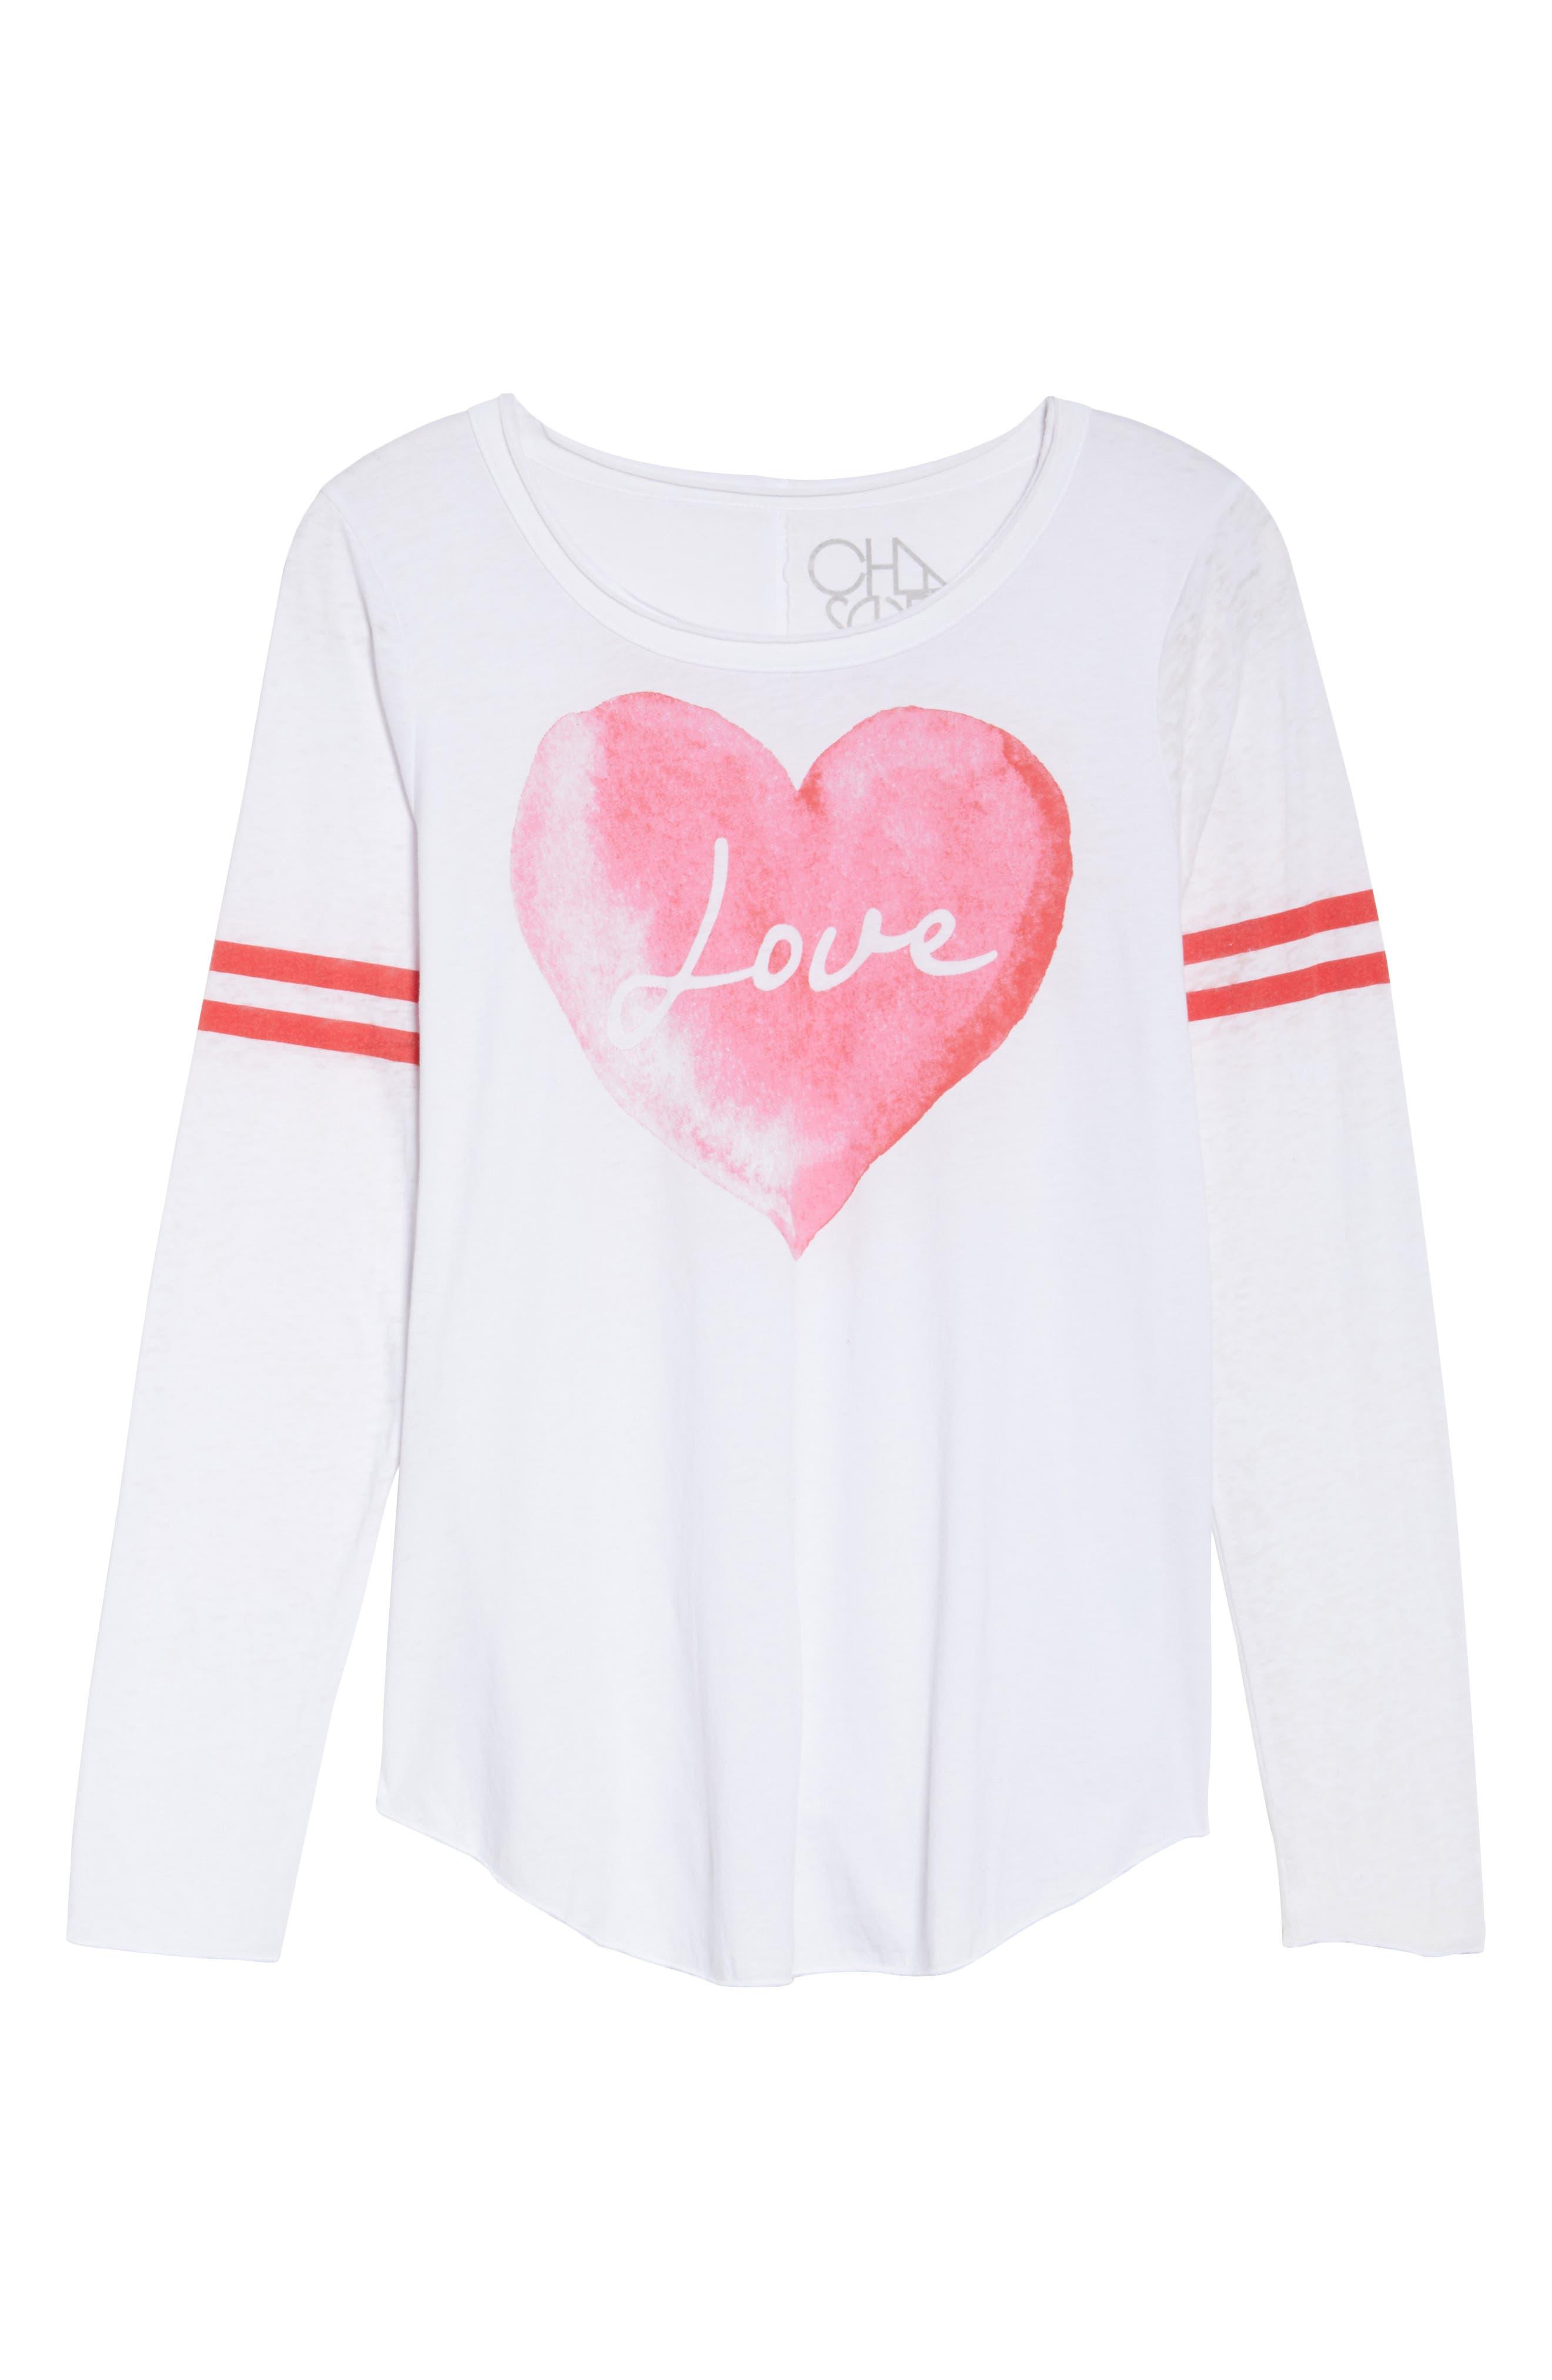 Lover Heart Tee,                             Alternate thumbnail 6, color,                             100